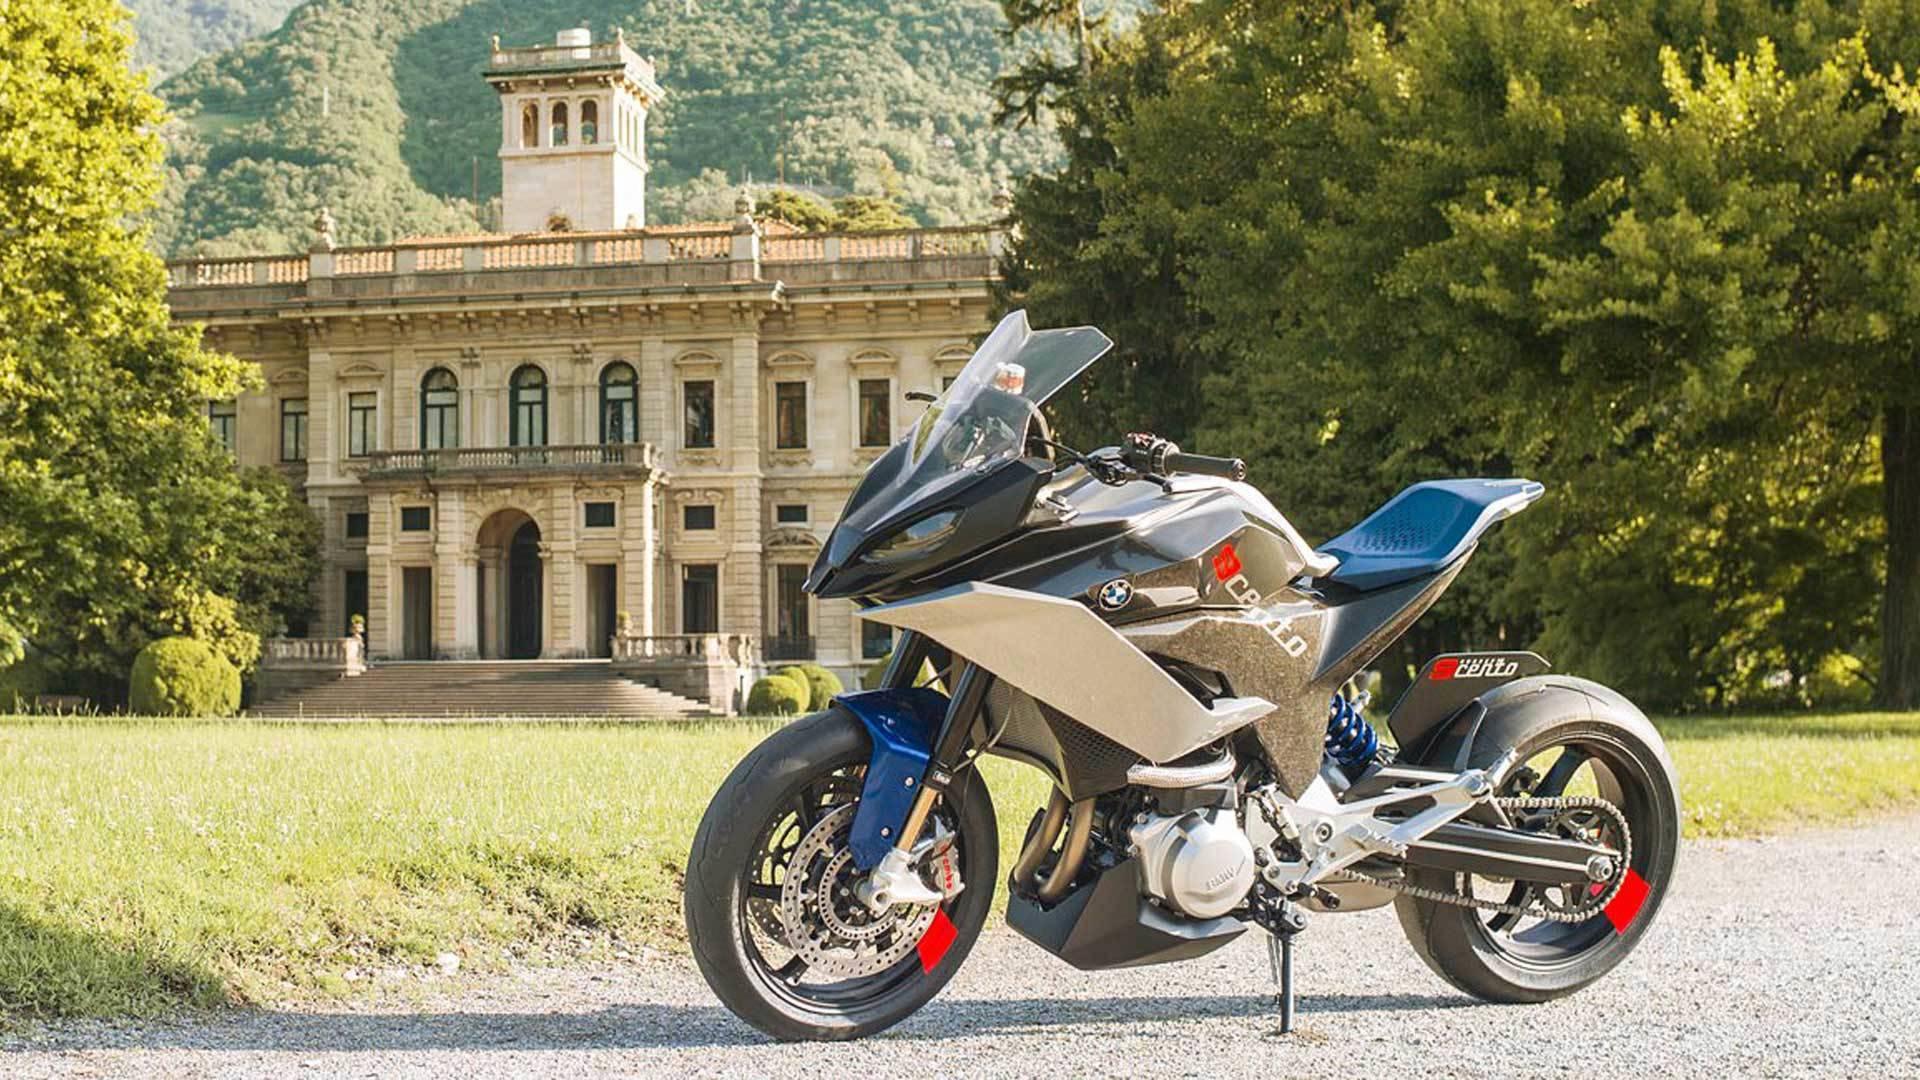 Bmw Motorrad Unveils Sexy New Concept 9cento